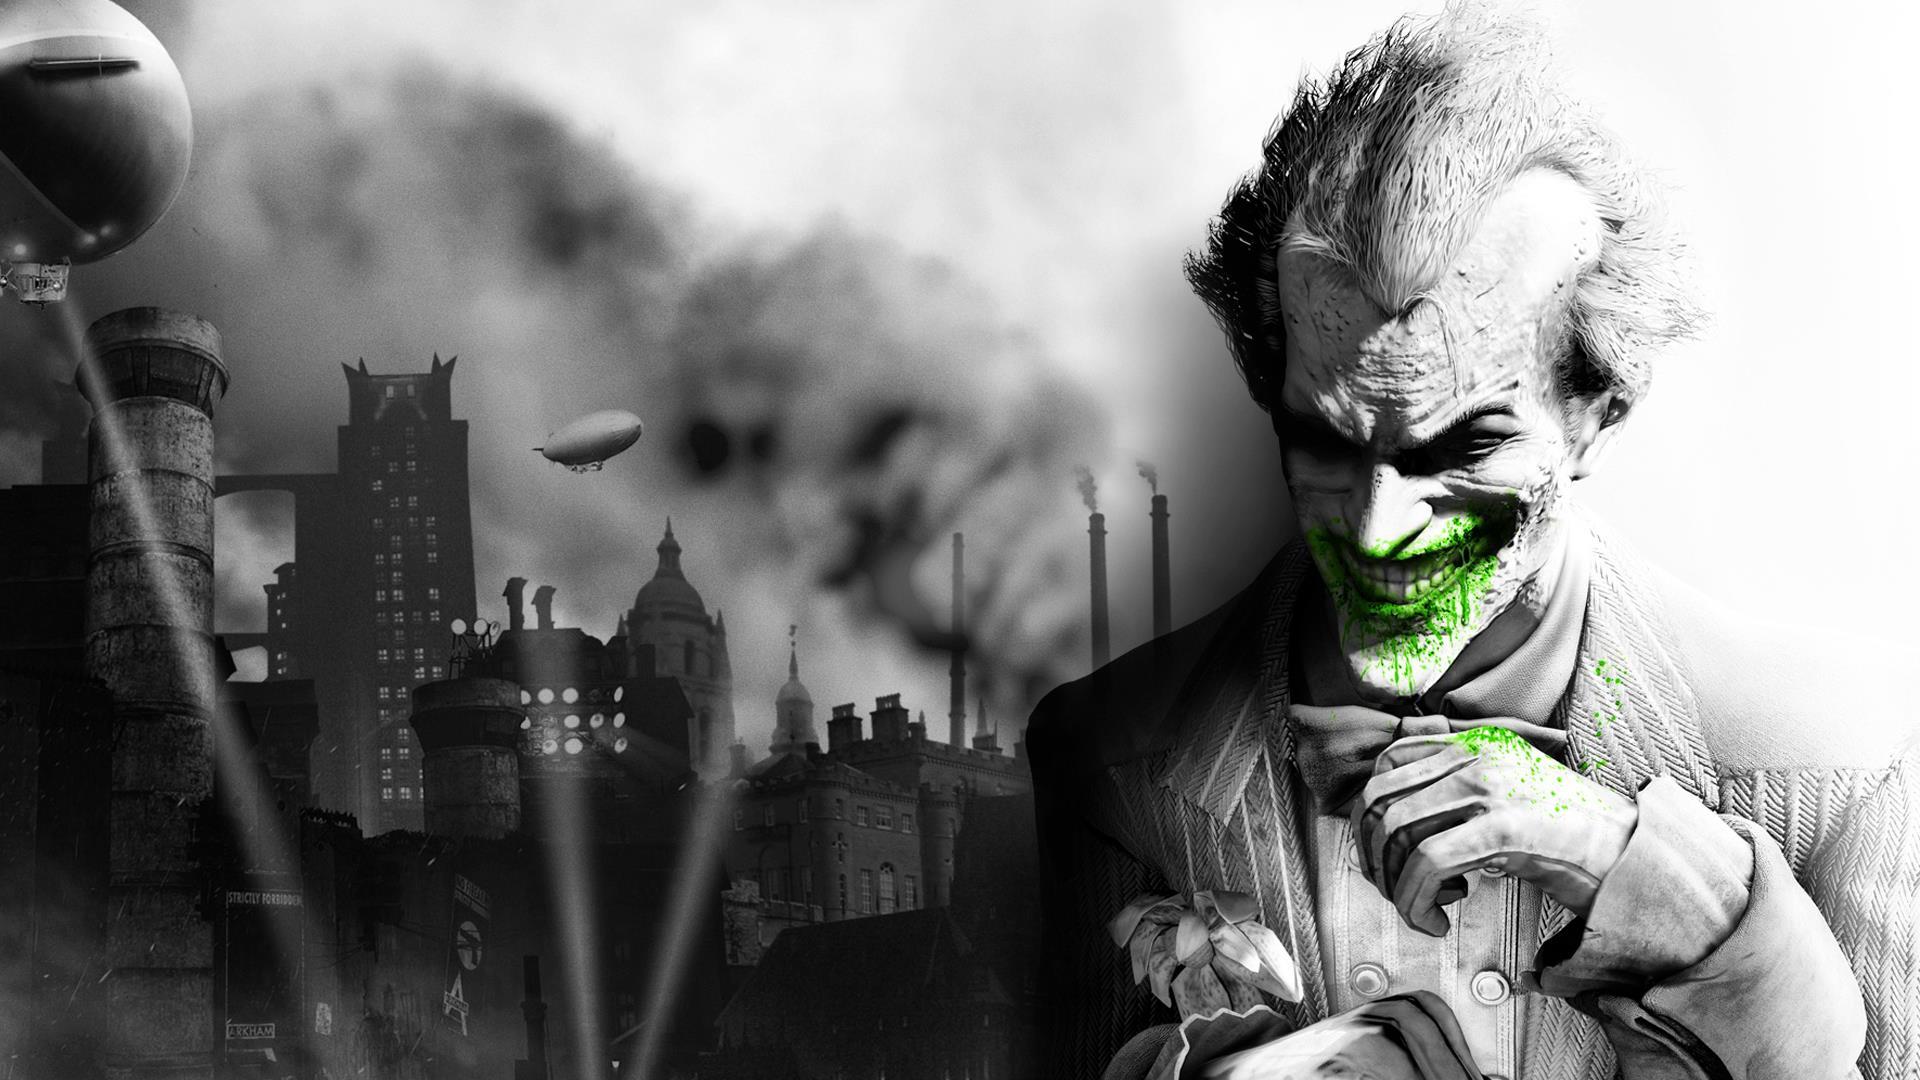 Joker Why So Serious Wallpaper P Cool Hd